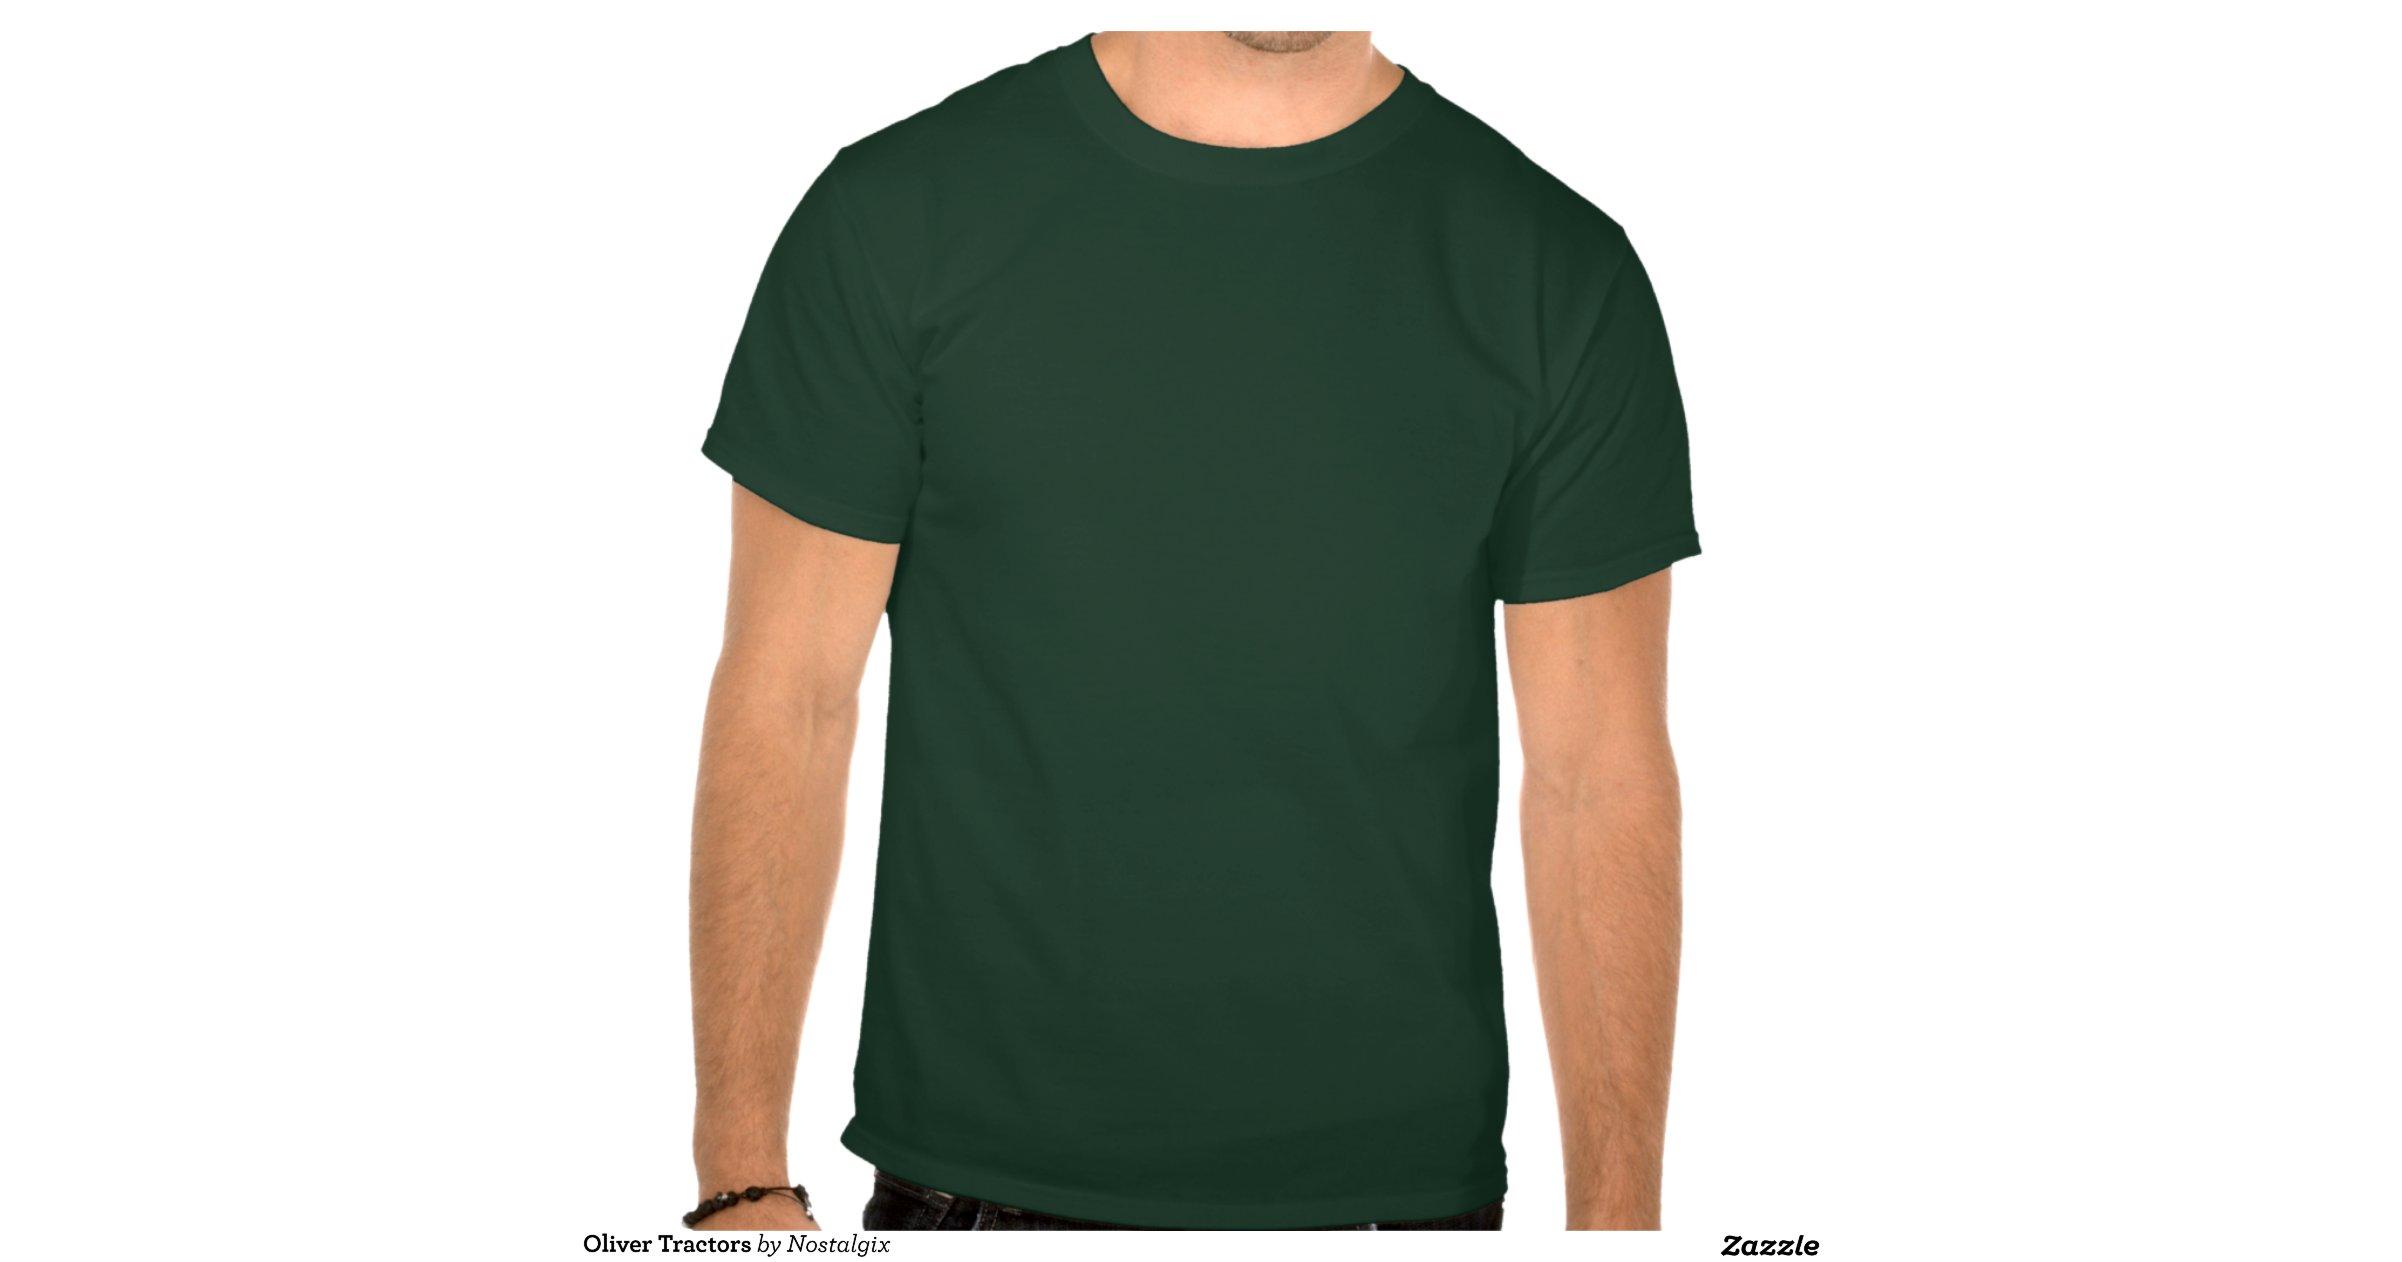 oliver tractors tee shirts zazzle. Black Bedroom Furniture Sets. Home Design Ideas